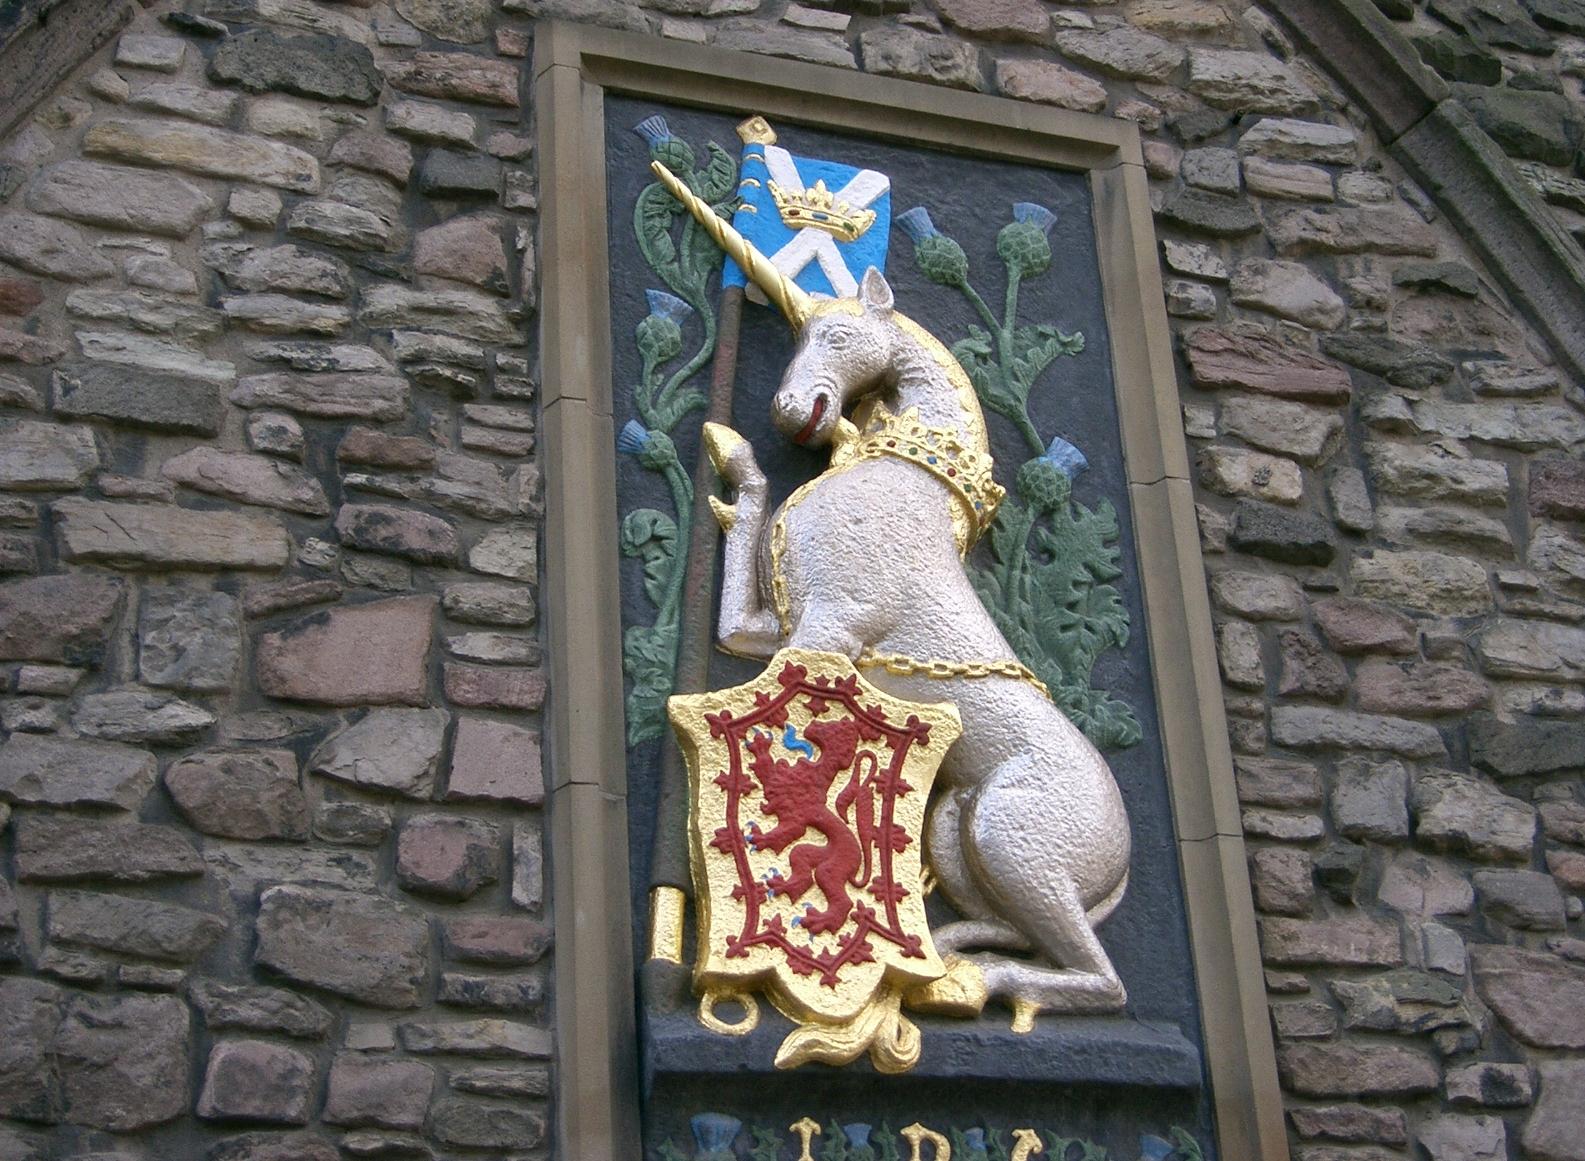 Unicorne_Edimbourg_Scotland.JPG